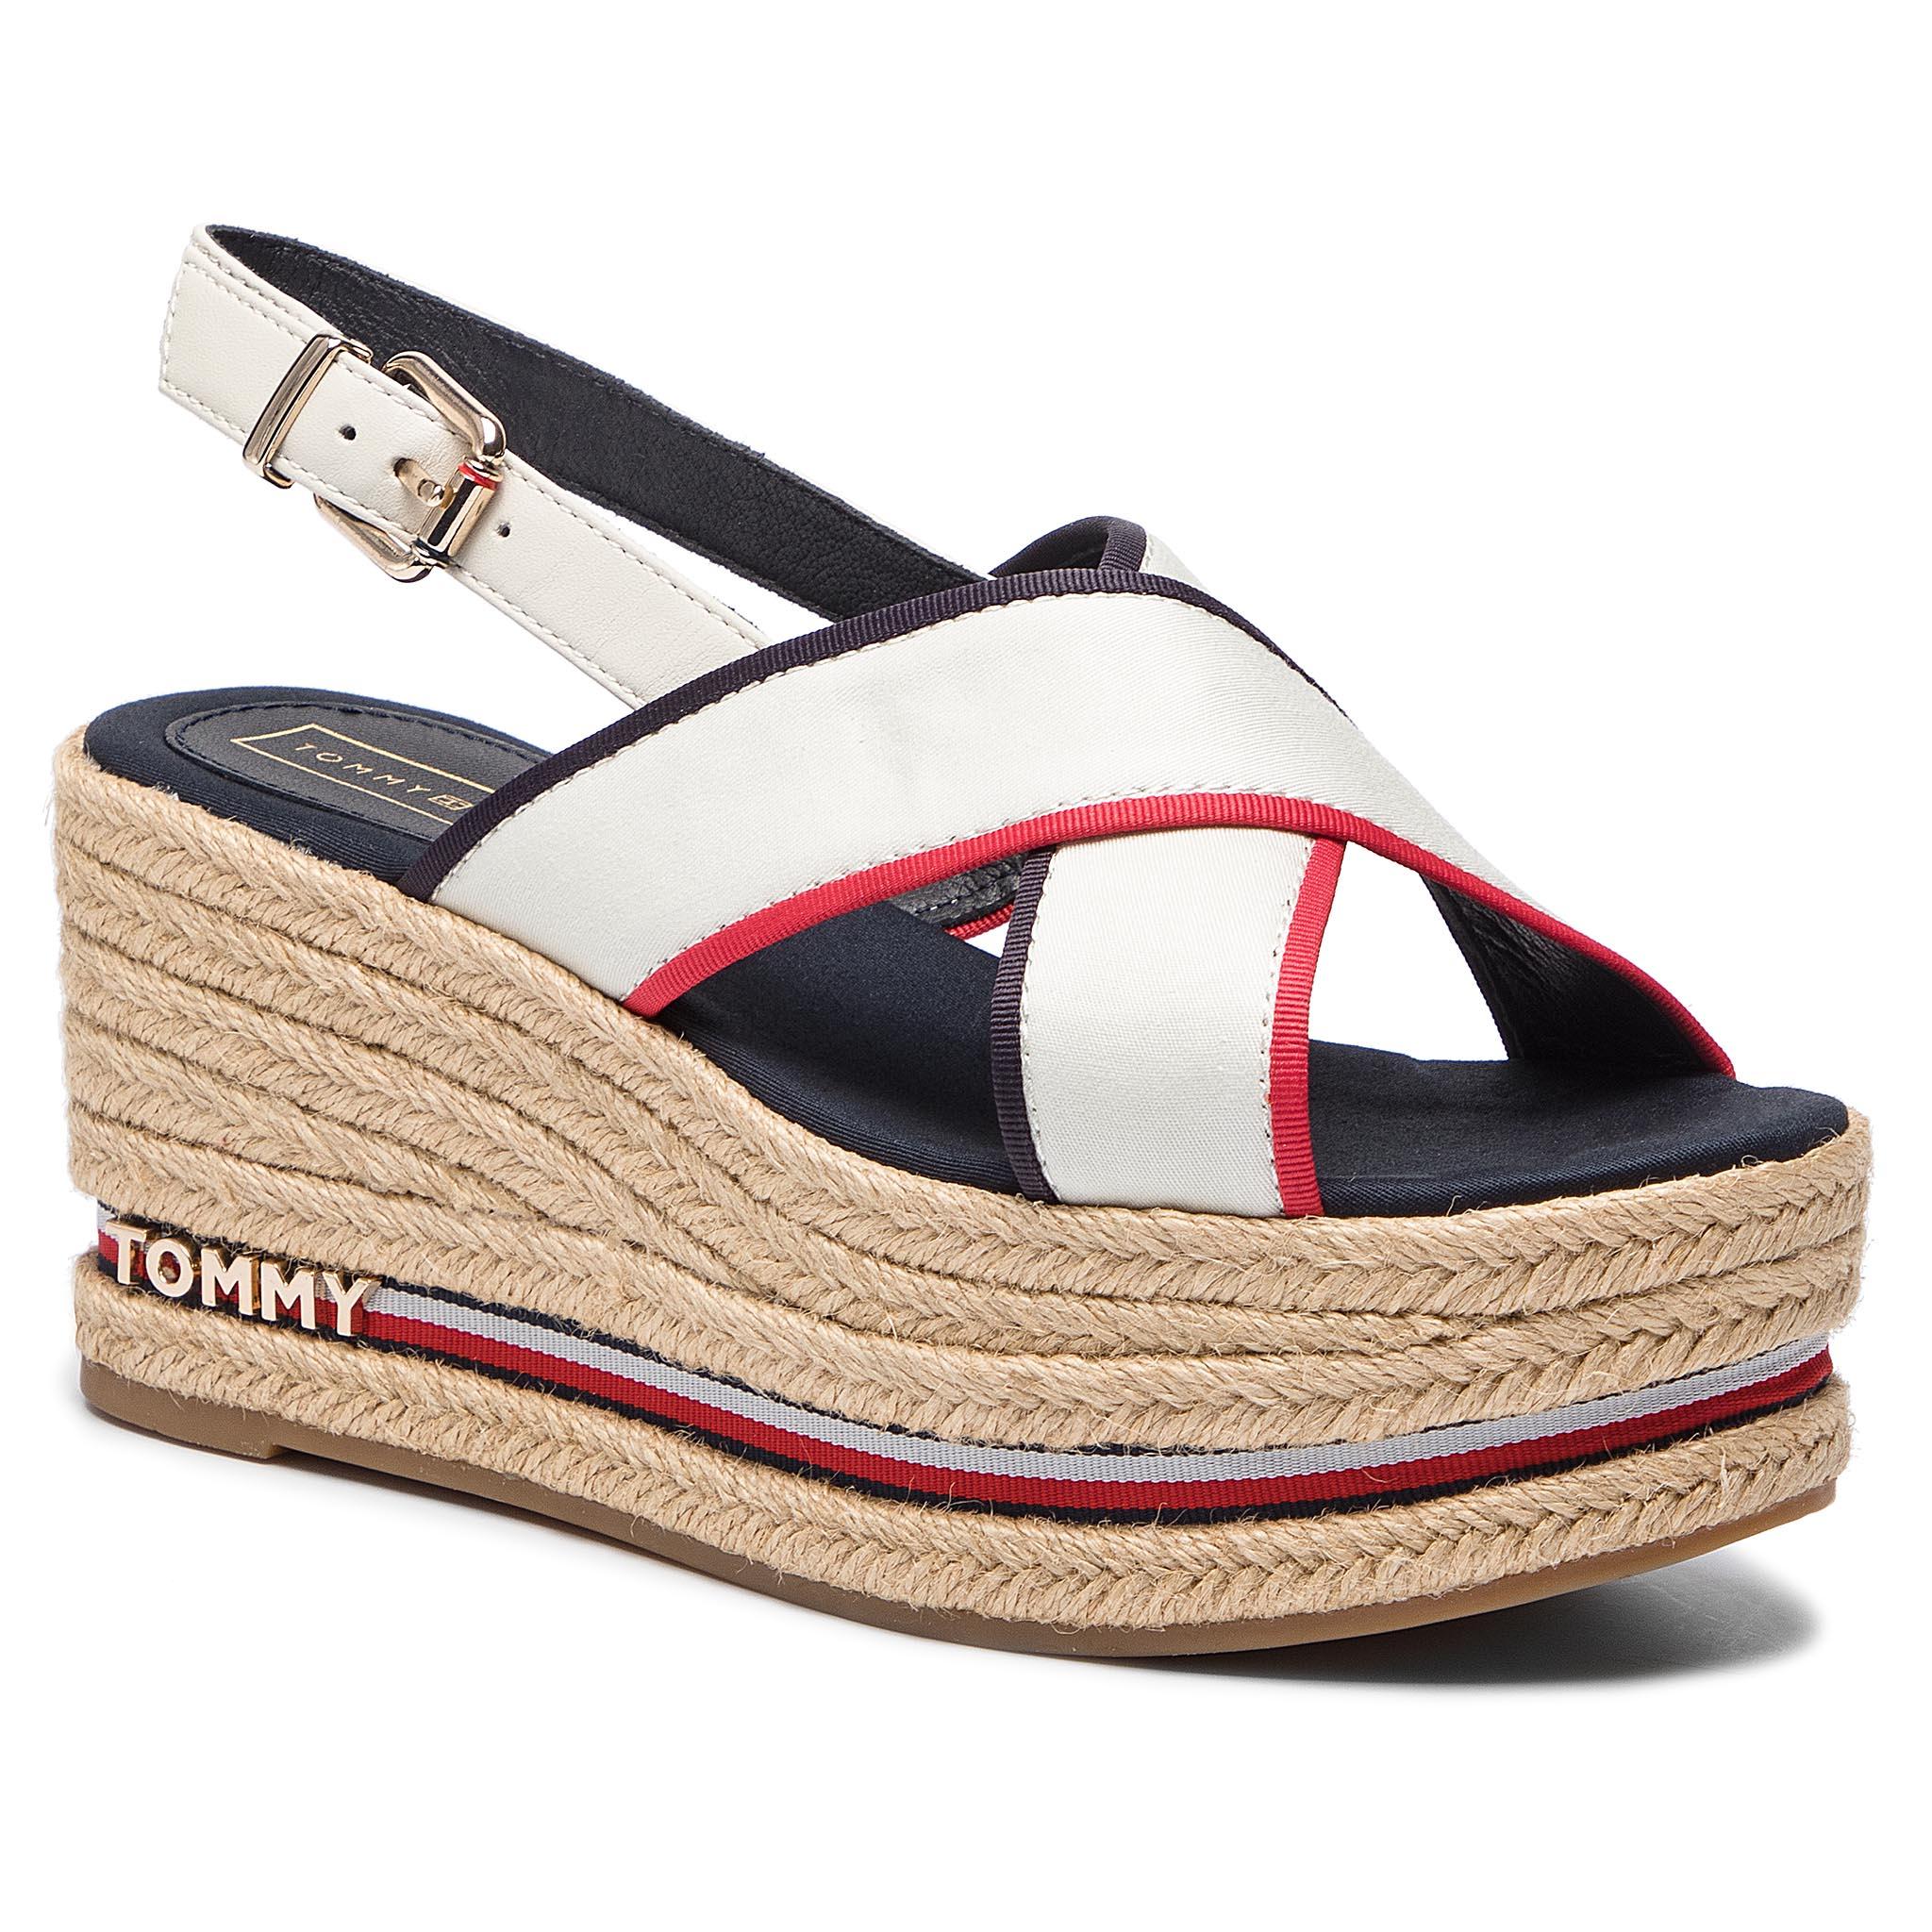 44e5c8d6b5ab ... HILFIGER Flatform Sandal Corporate Ribbon FW0FW04025. -7%. TOMMY ...